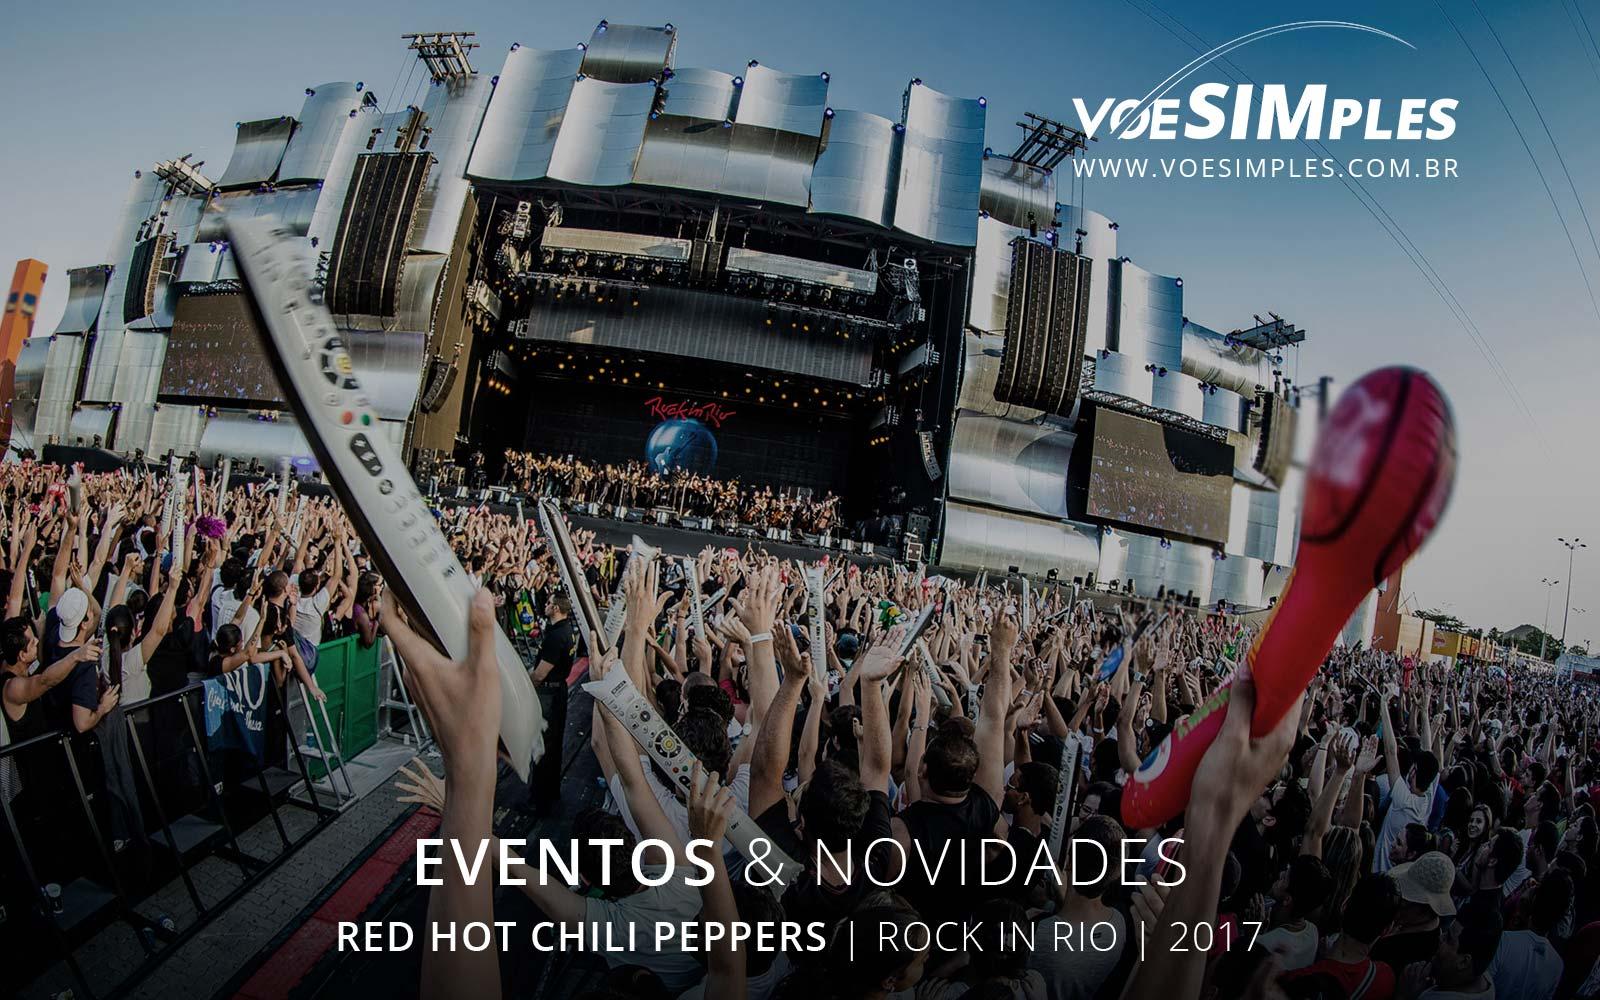 fotos-rock-rio-red-hot-rio-janeiro-2017-voesimples-passagem-aerea-promocional-red-hot-promocao-passagens-aereas-red-hot-2017-04